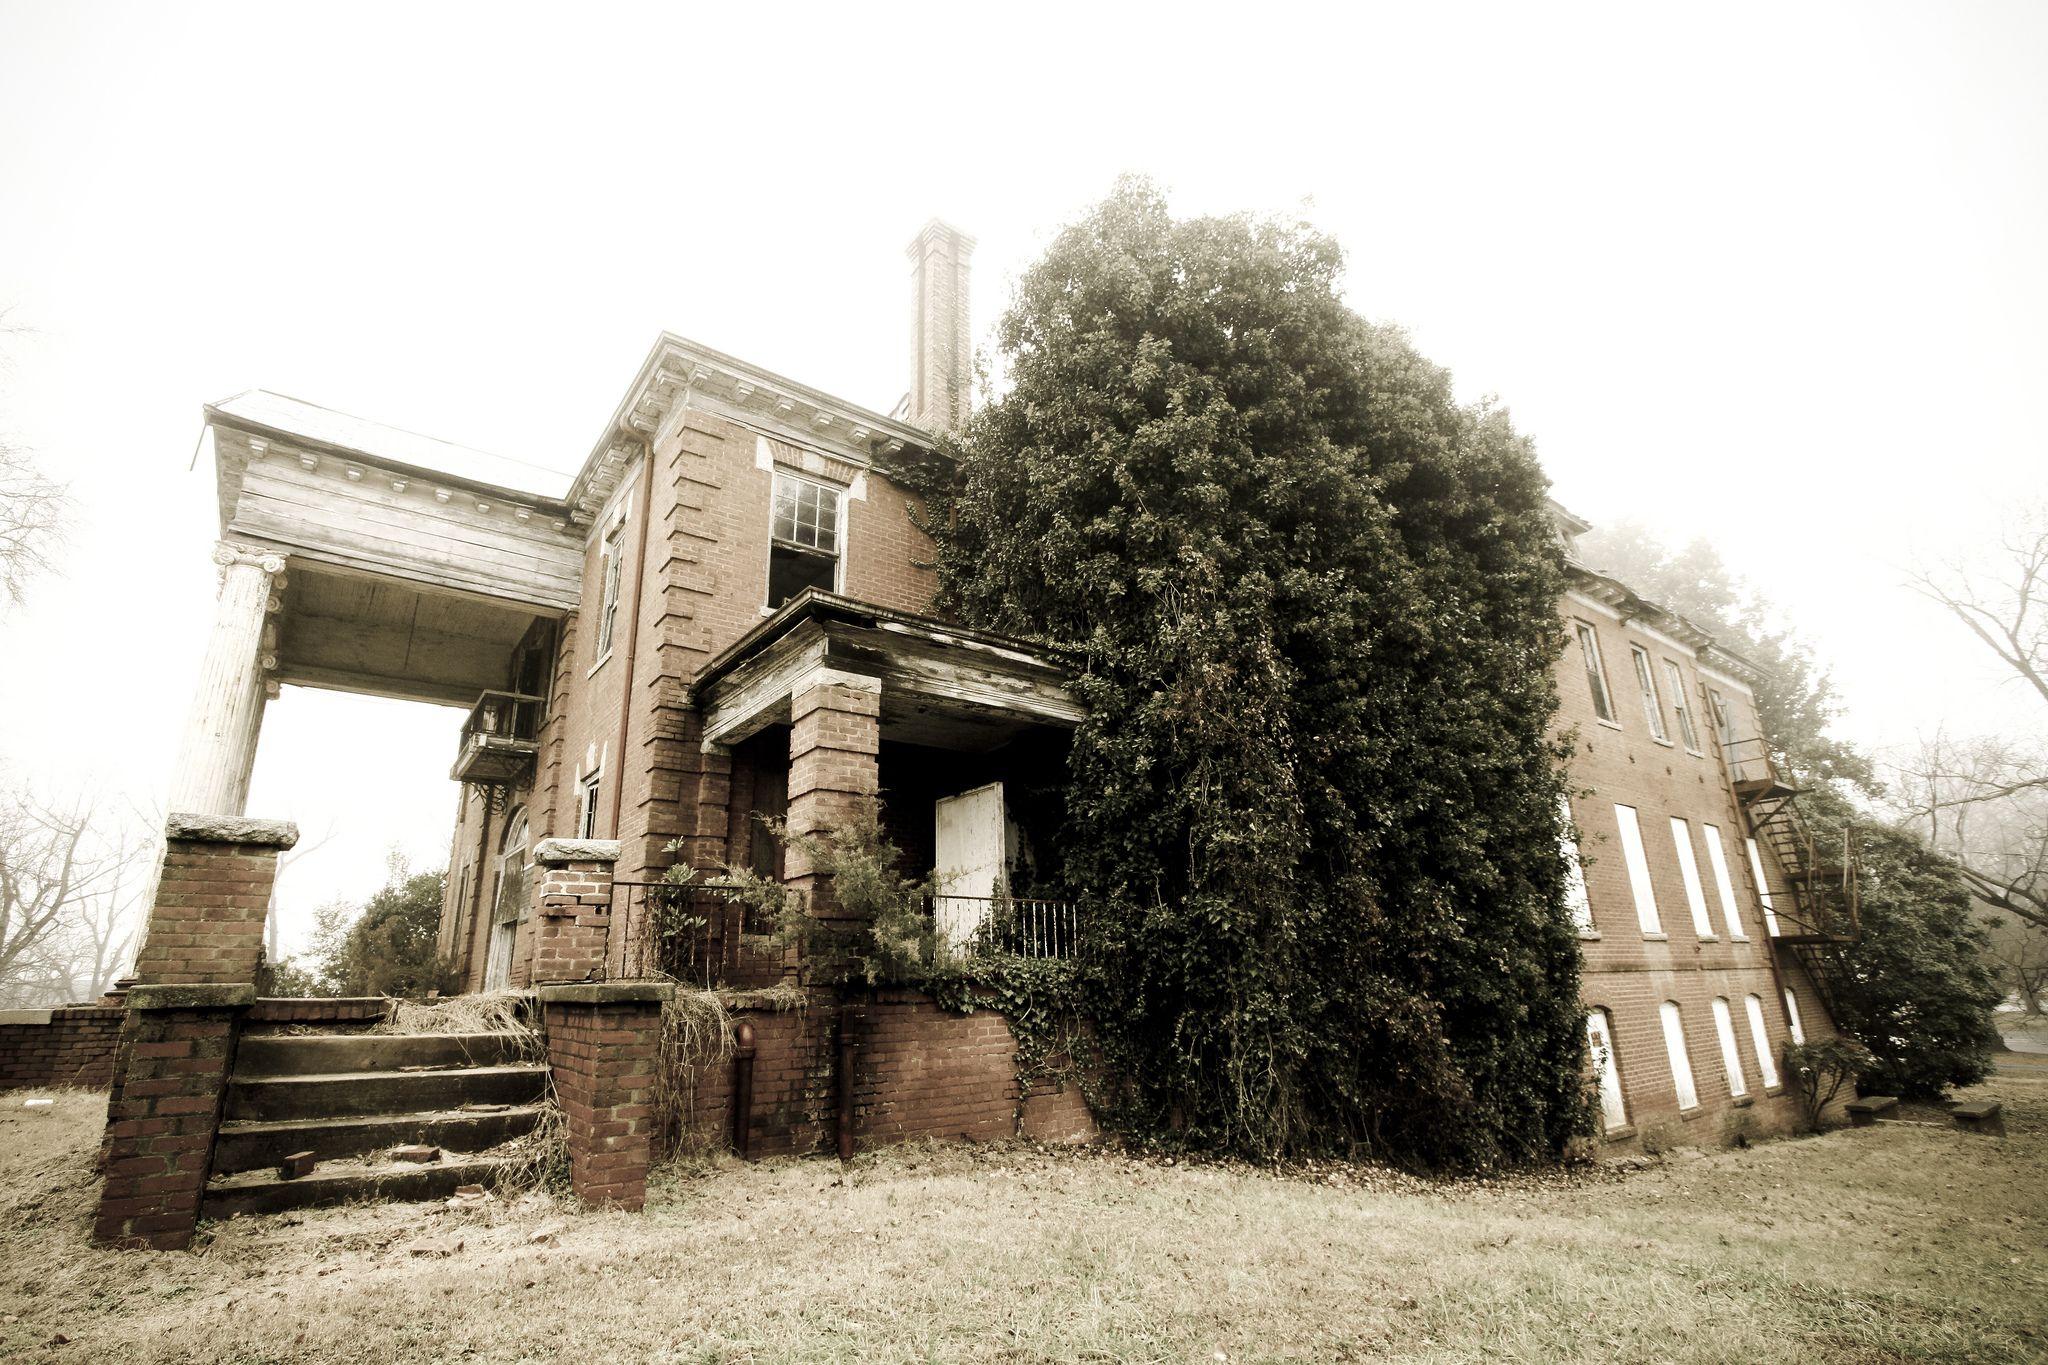 This Creepy School In North Carolina Is Still Standingu2026 And Still Disturbing